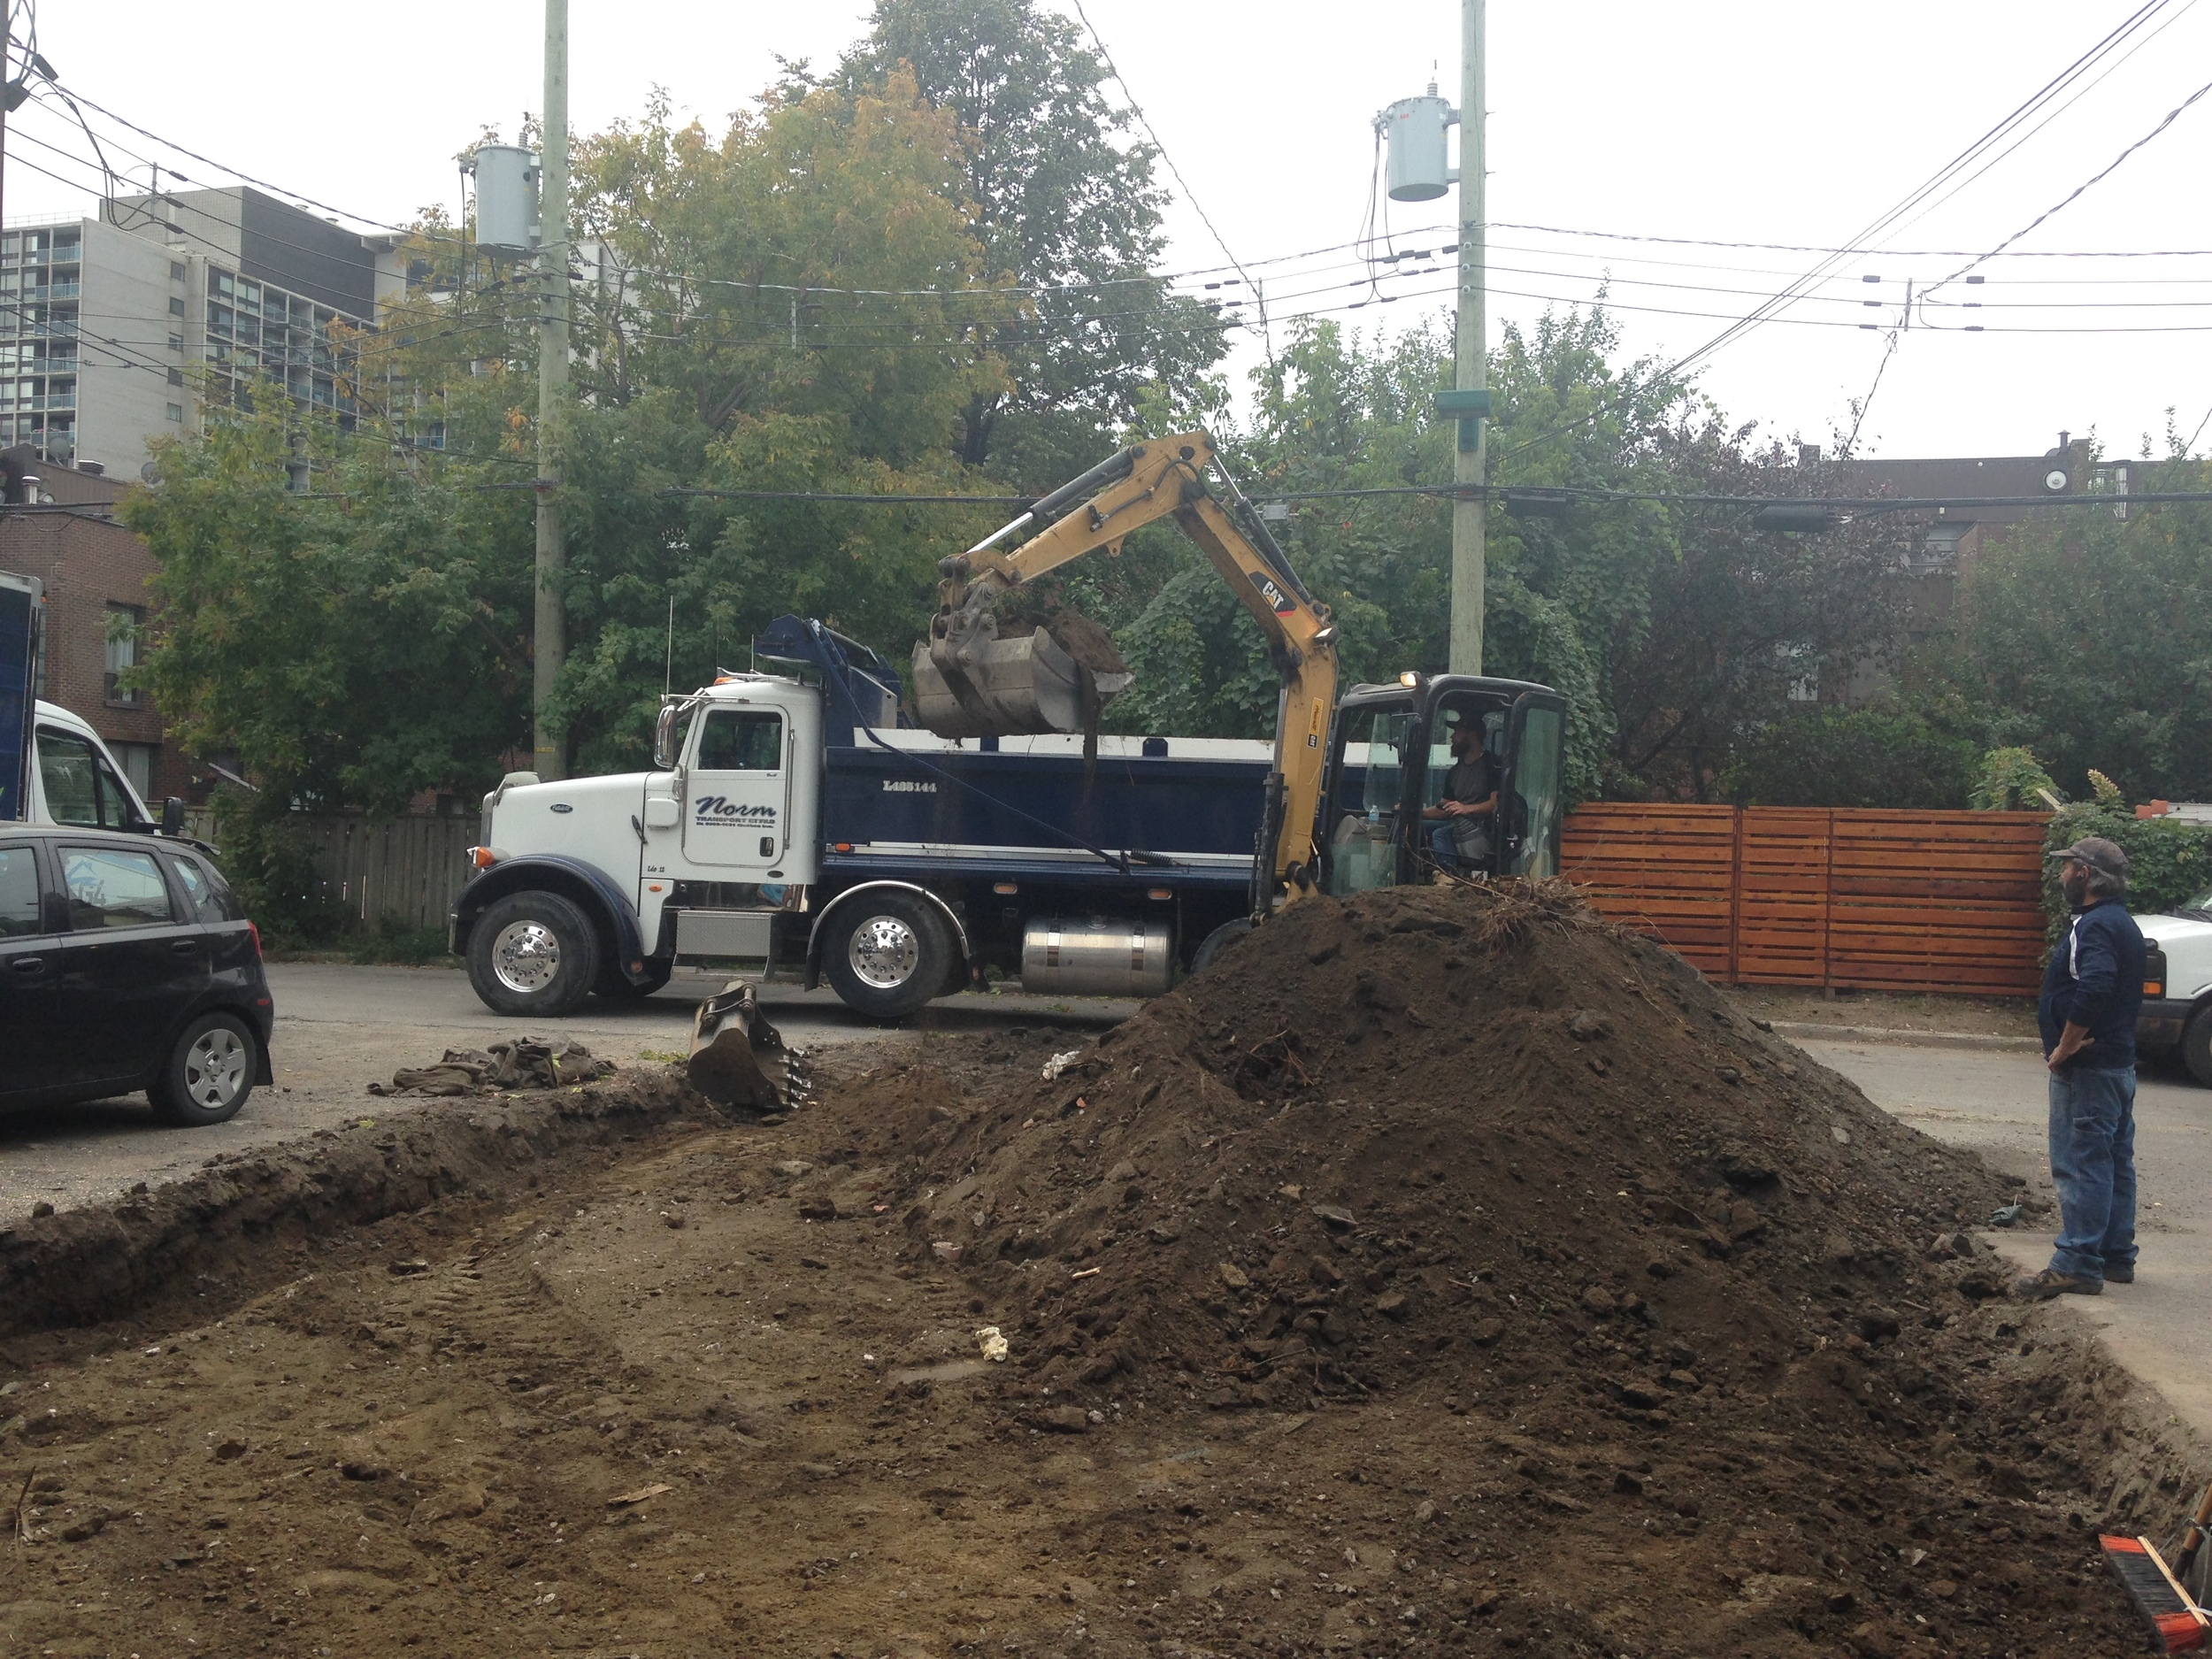 Bye, bye asphalt. Hello future garden...